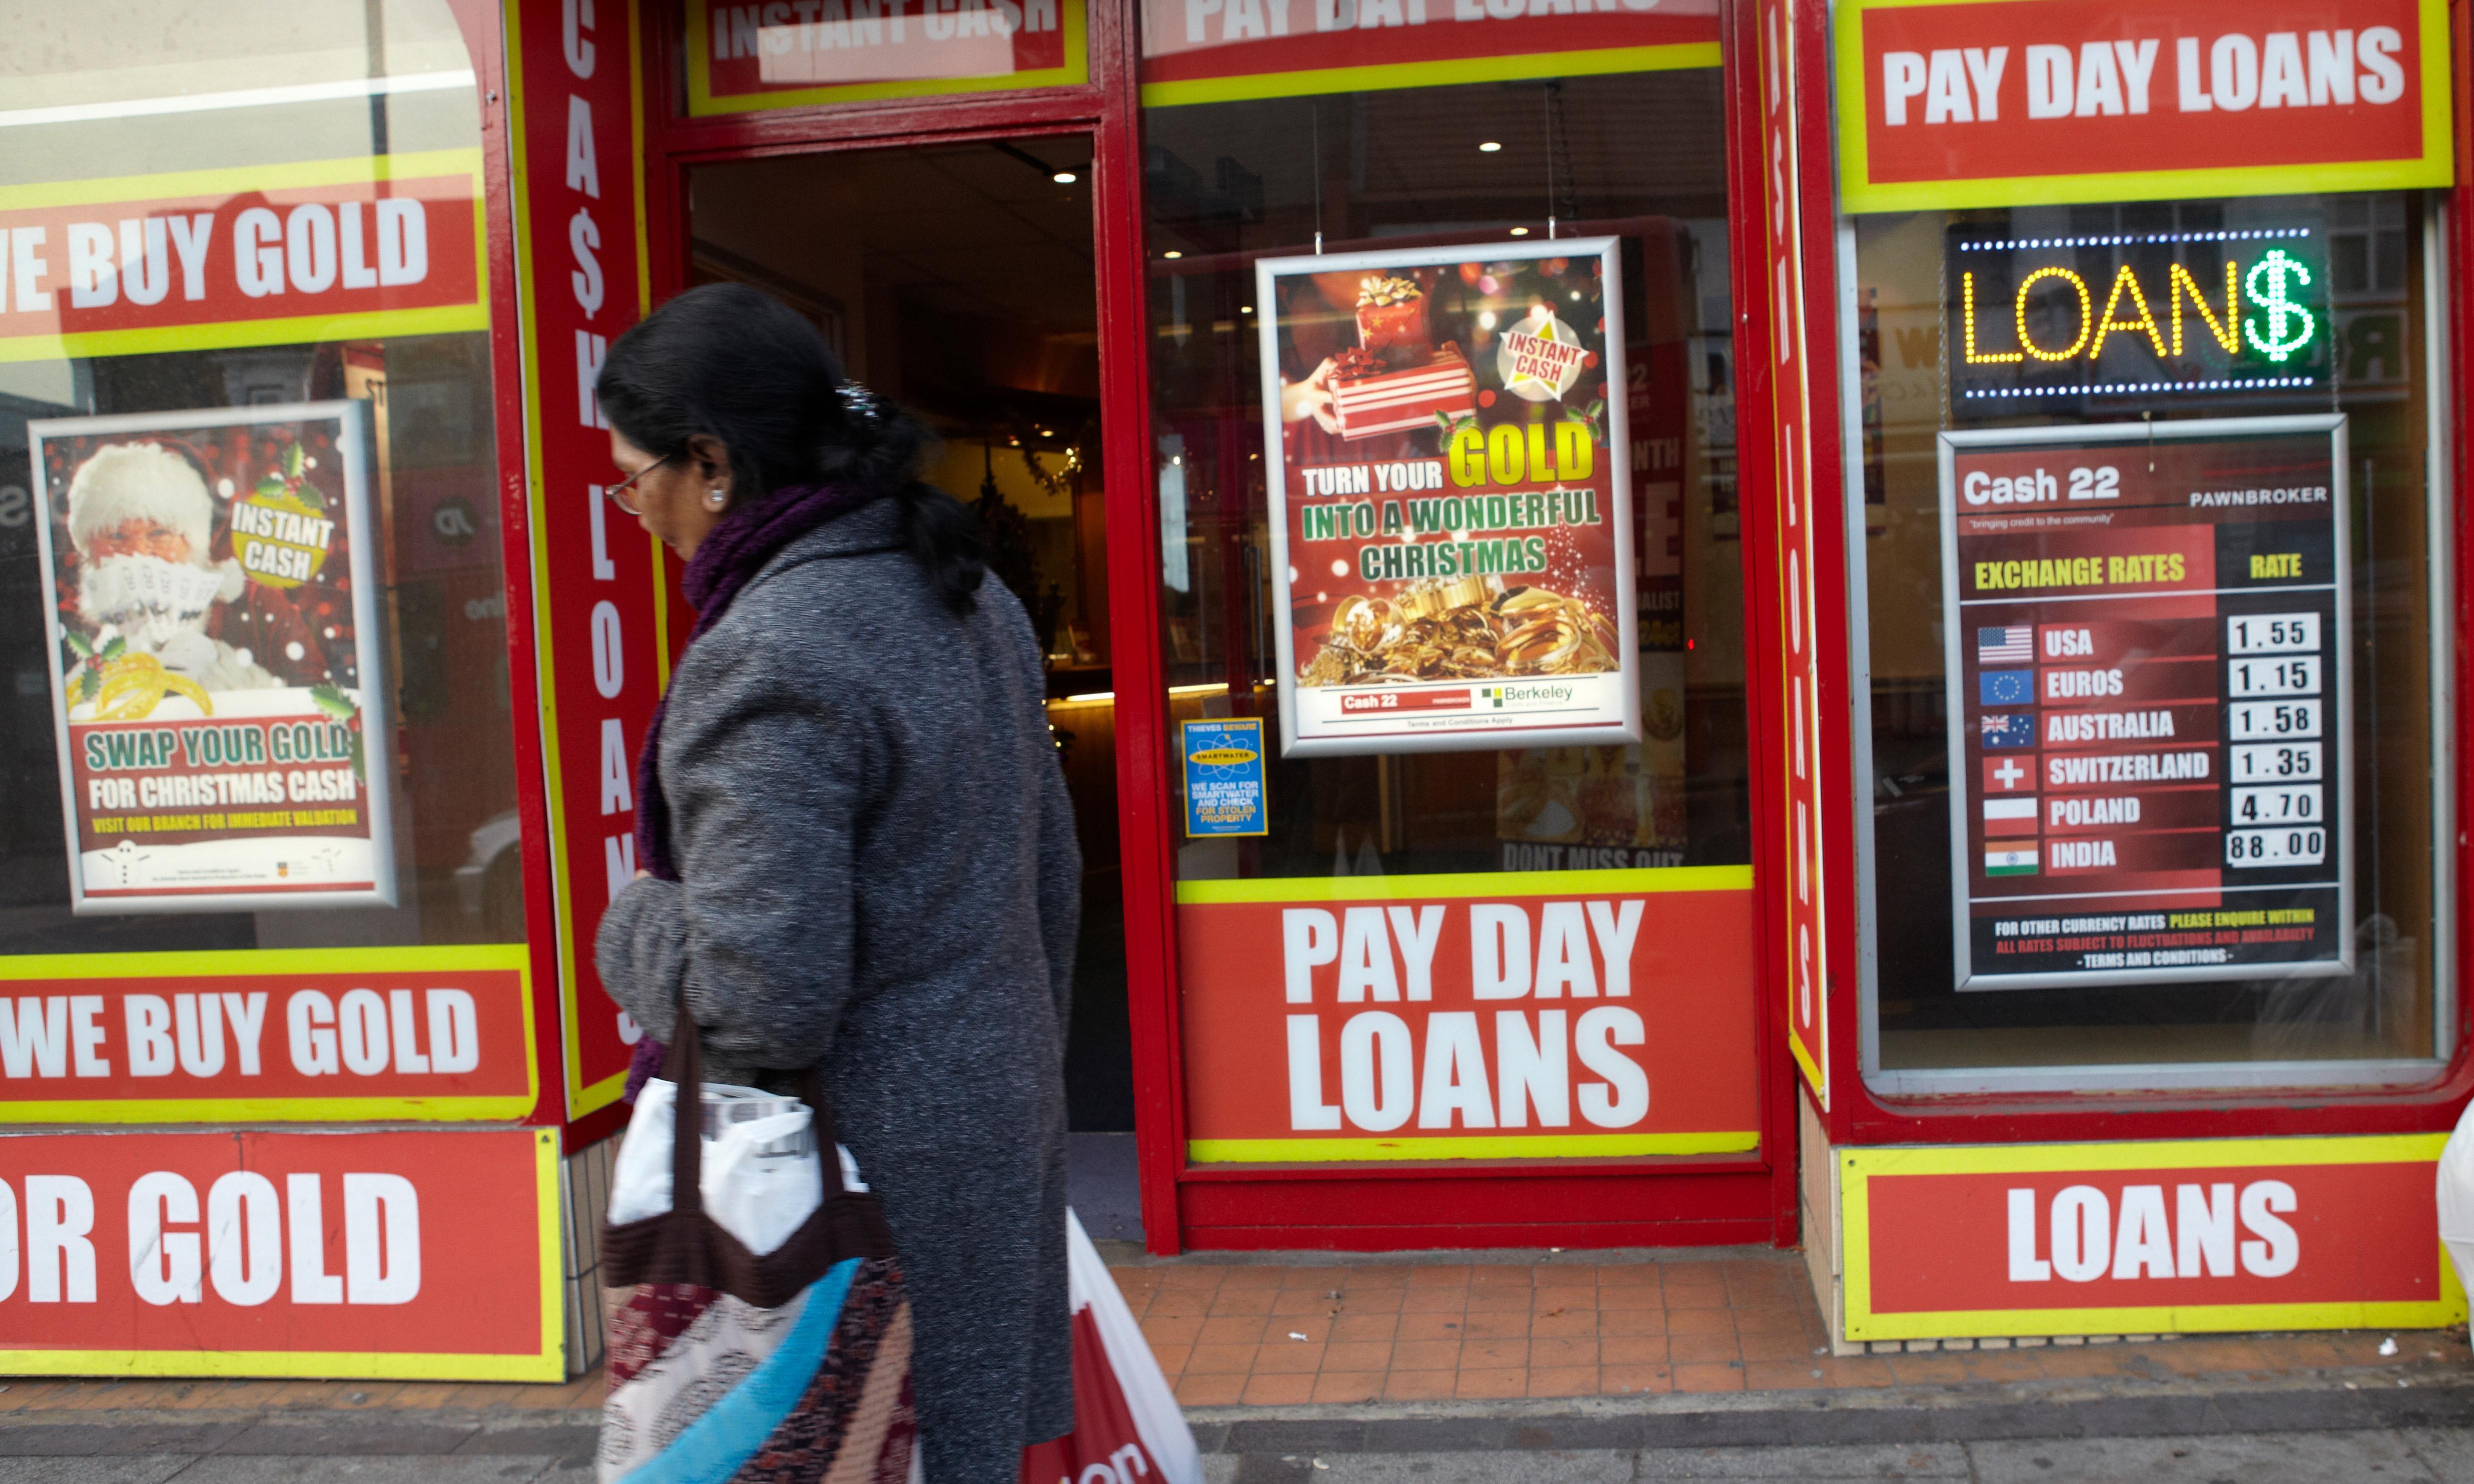 Payday lenders face sharp criticism as complaints rise 130%